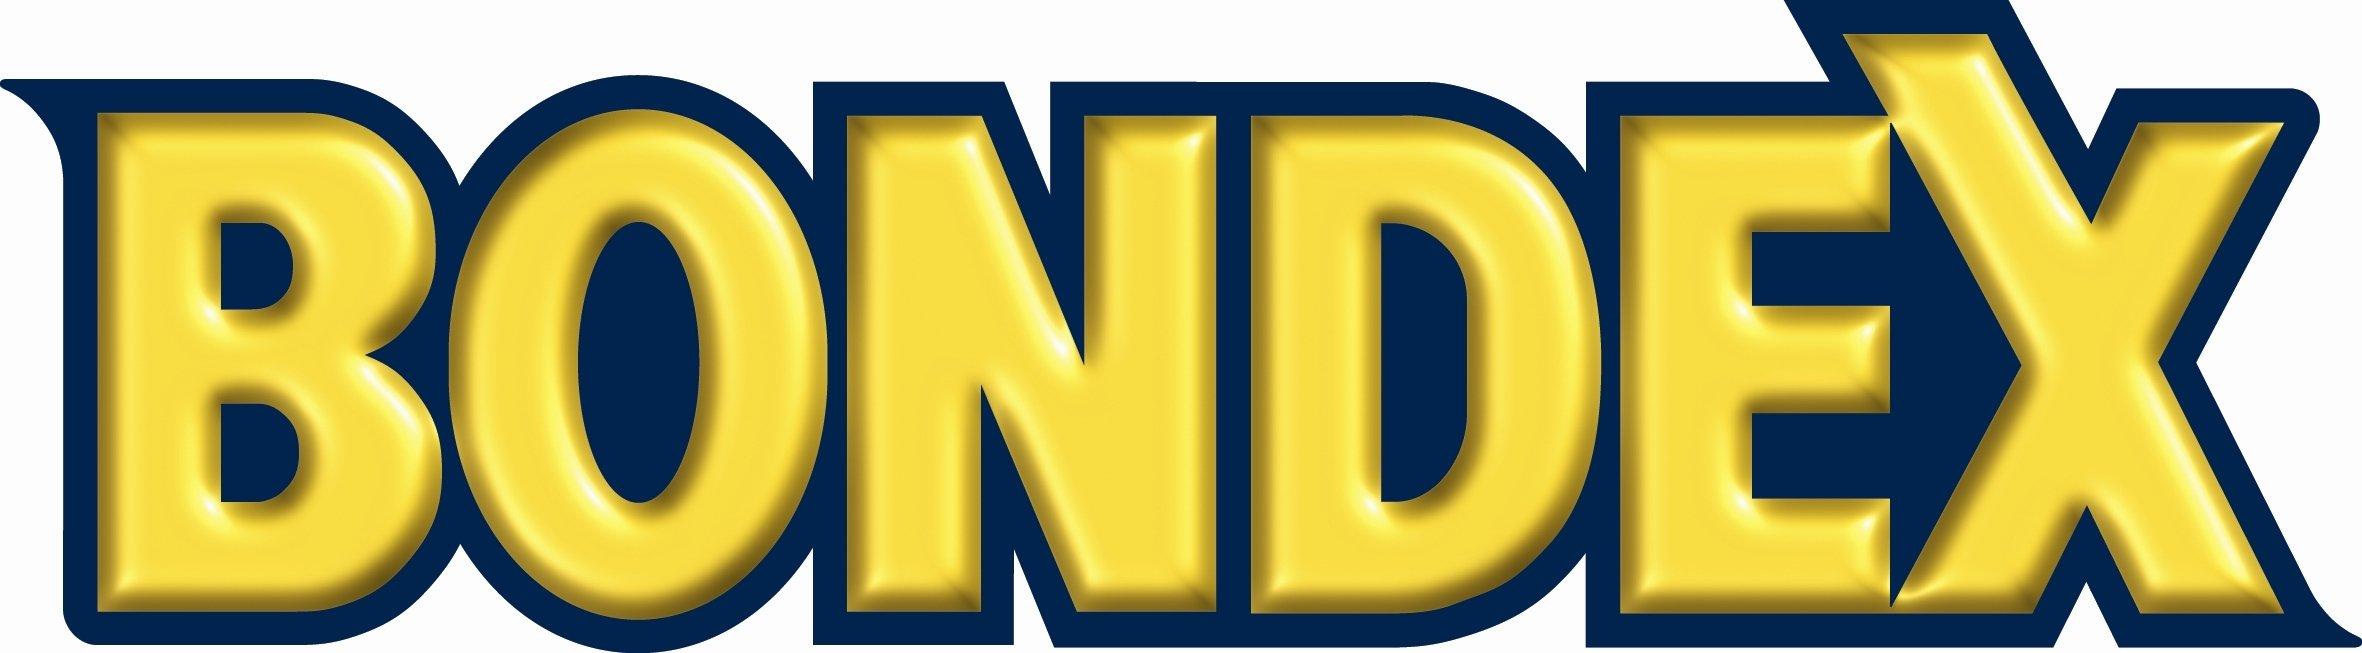 bondex-logo